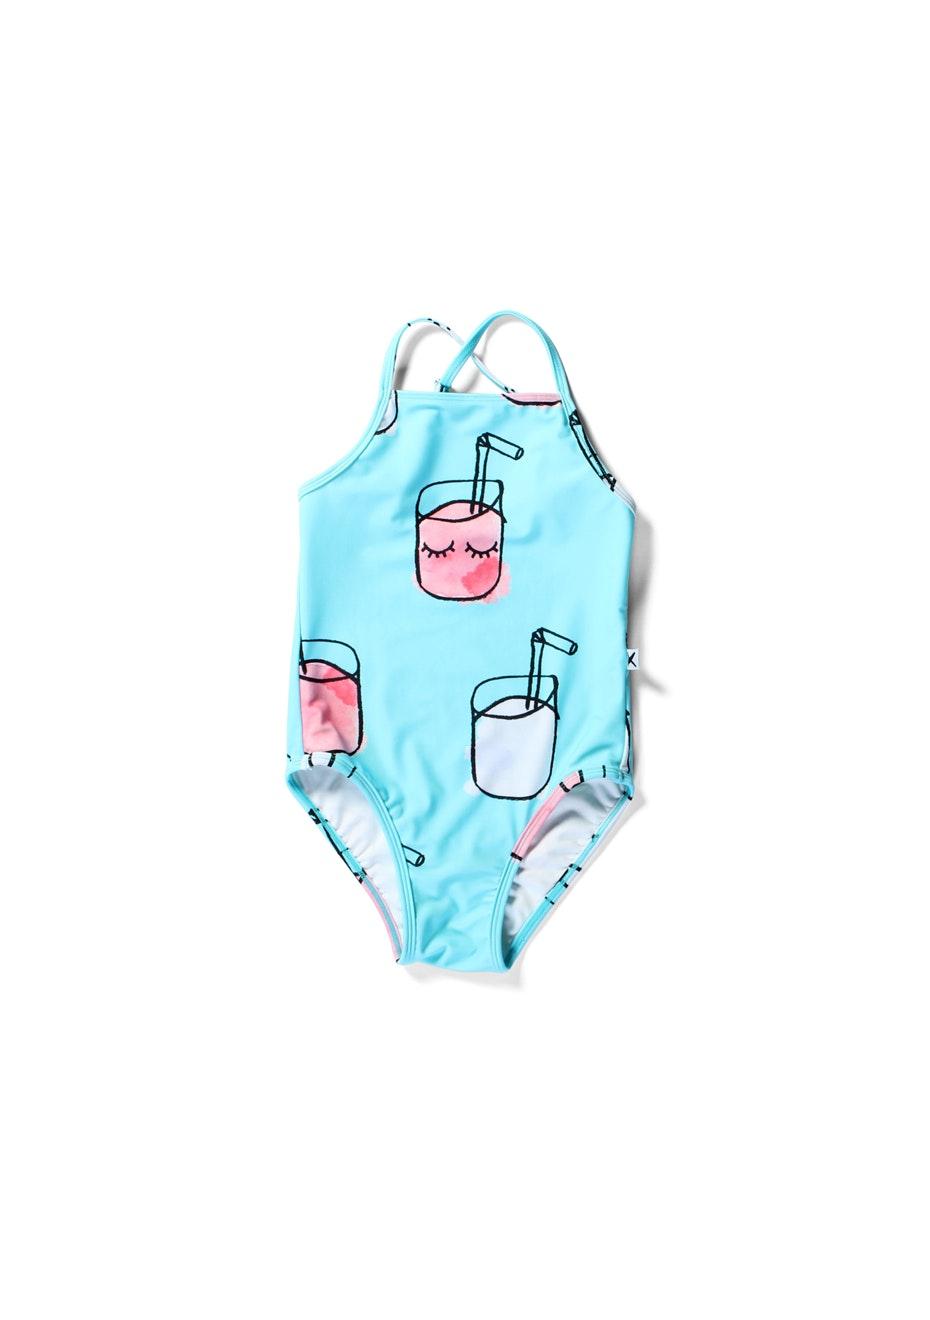 Minti - Cute Cups - Swimsuit - Girls - Blue